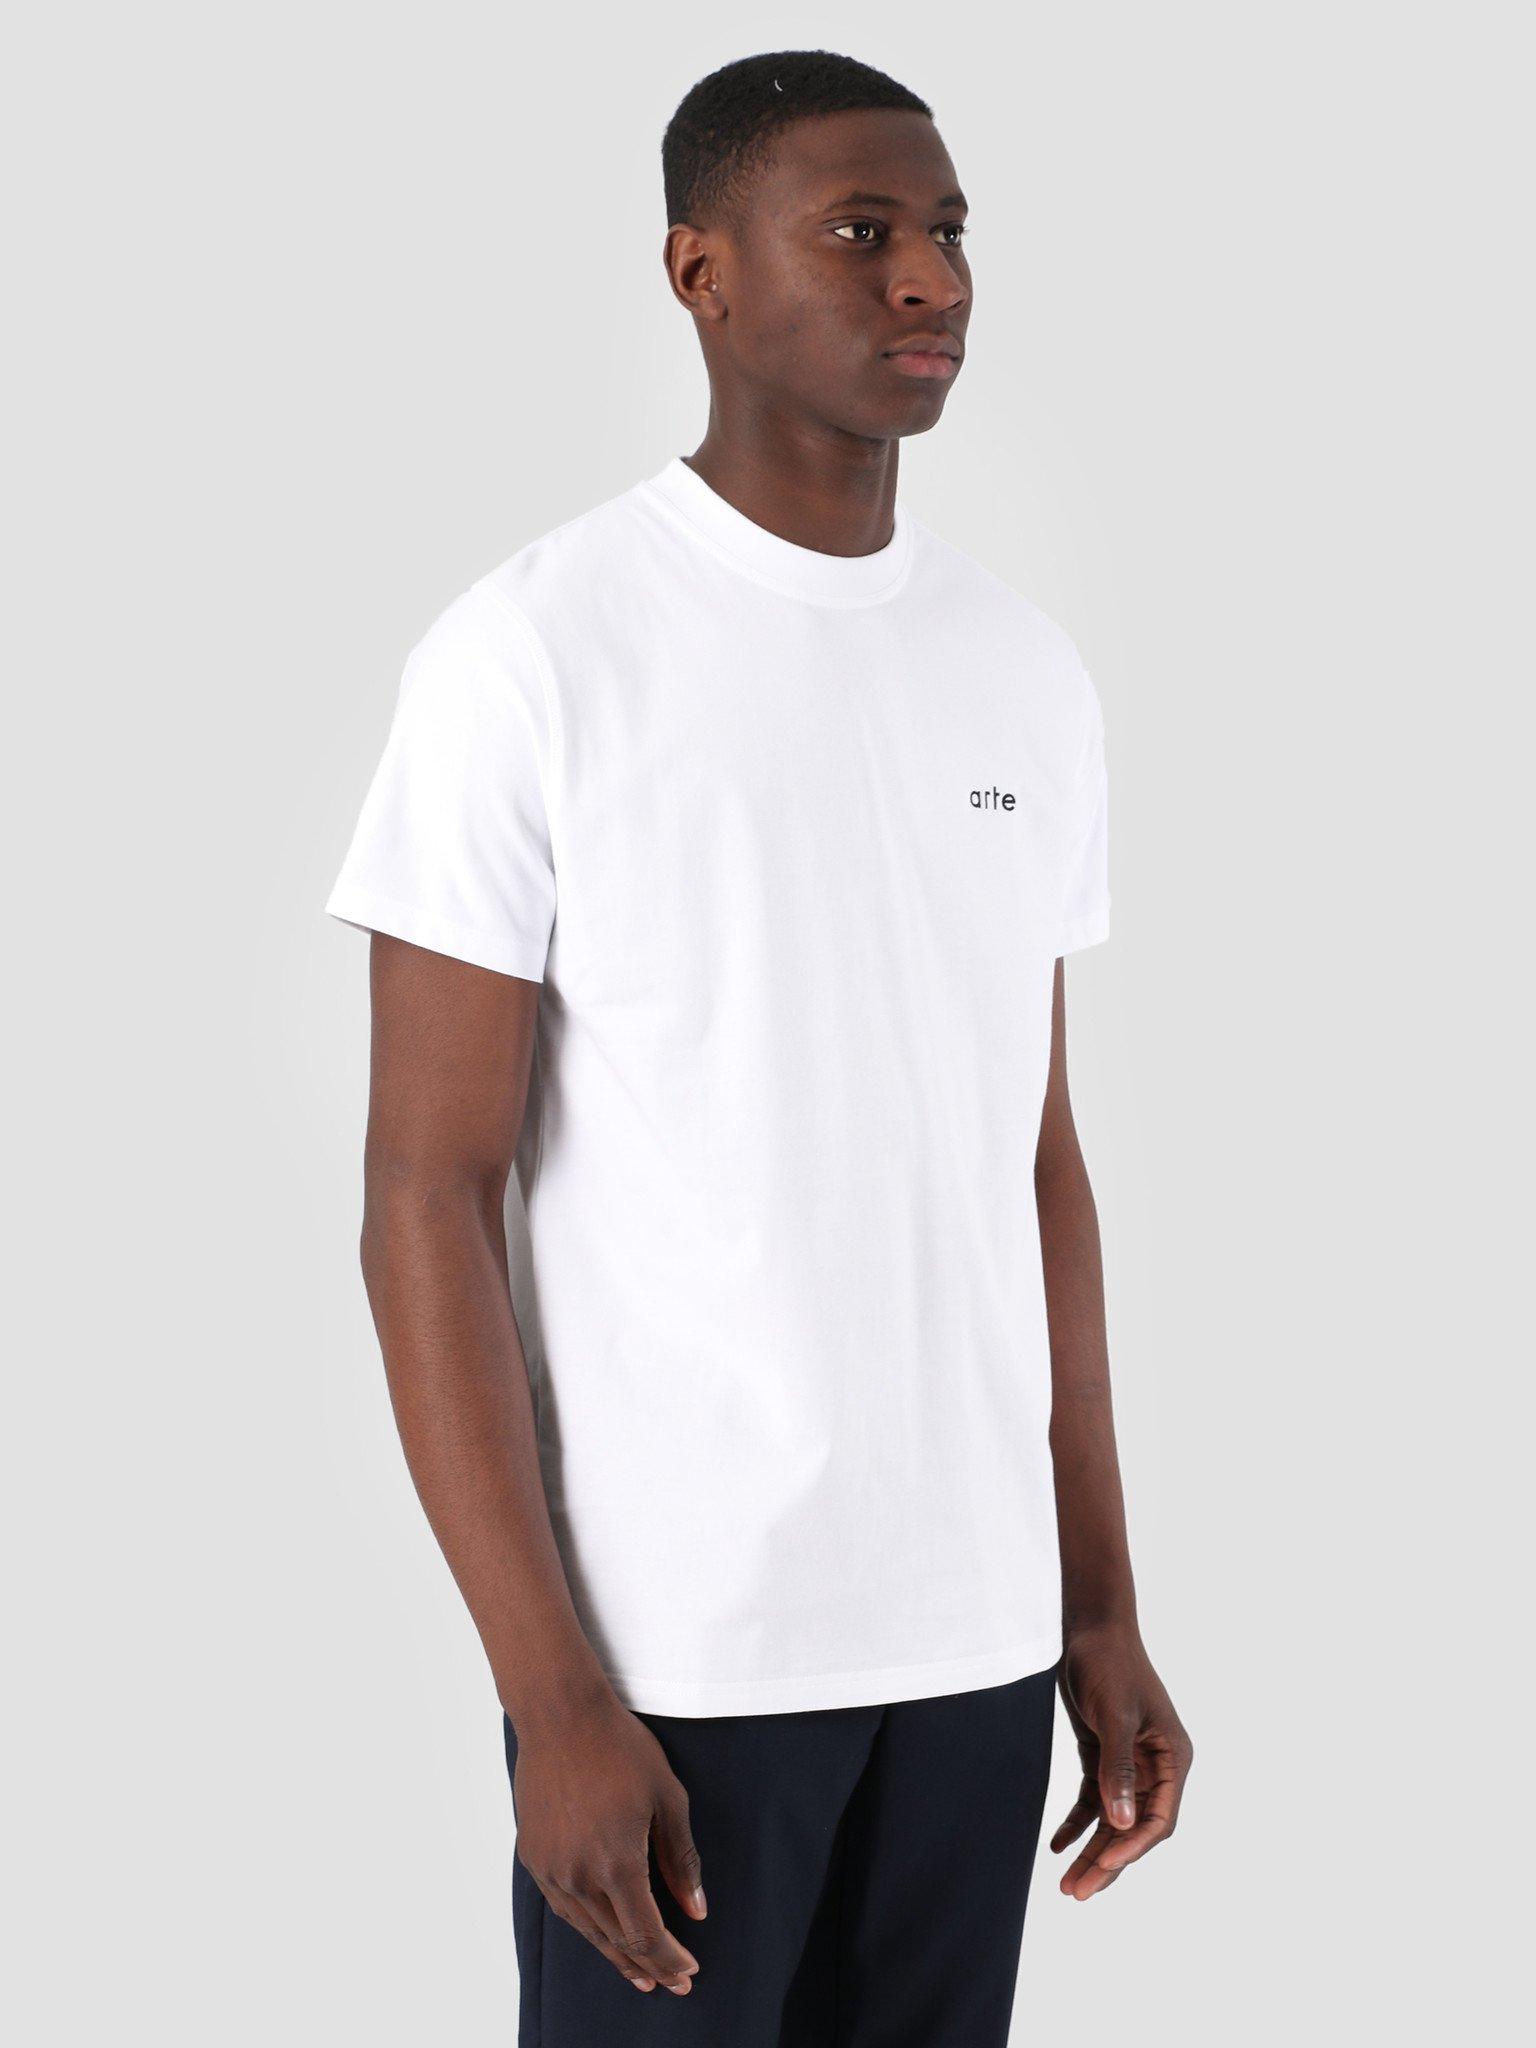 Arte Troy White 3759926 Antwerp Freshcotton T Shirt 4j5L3AR